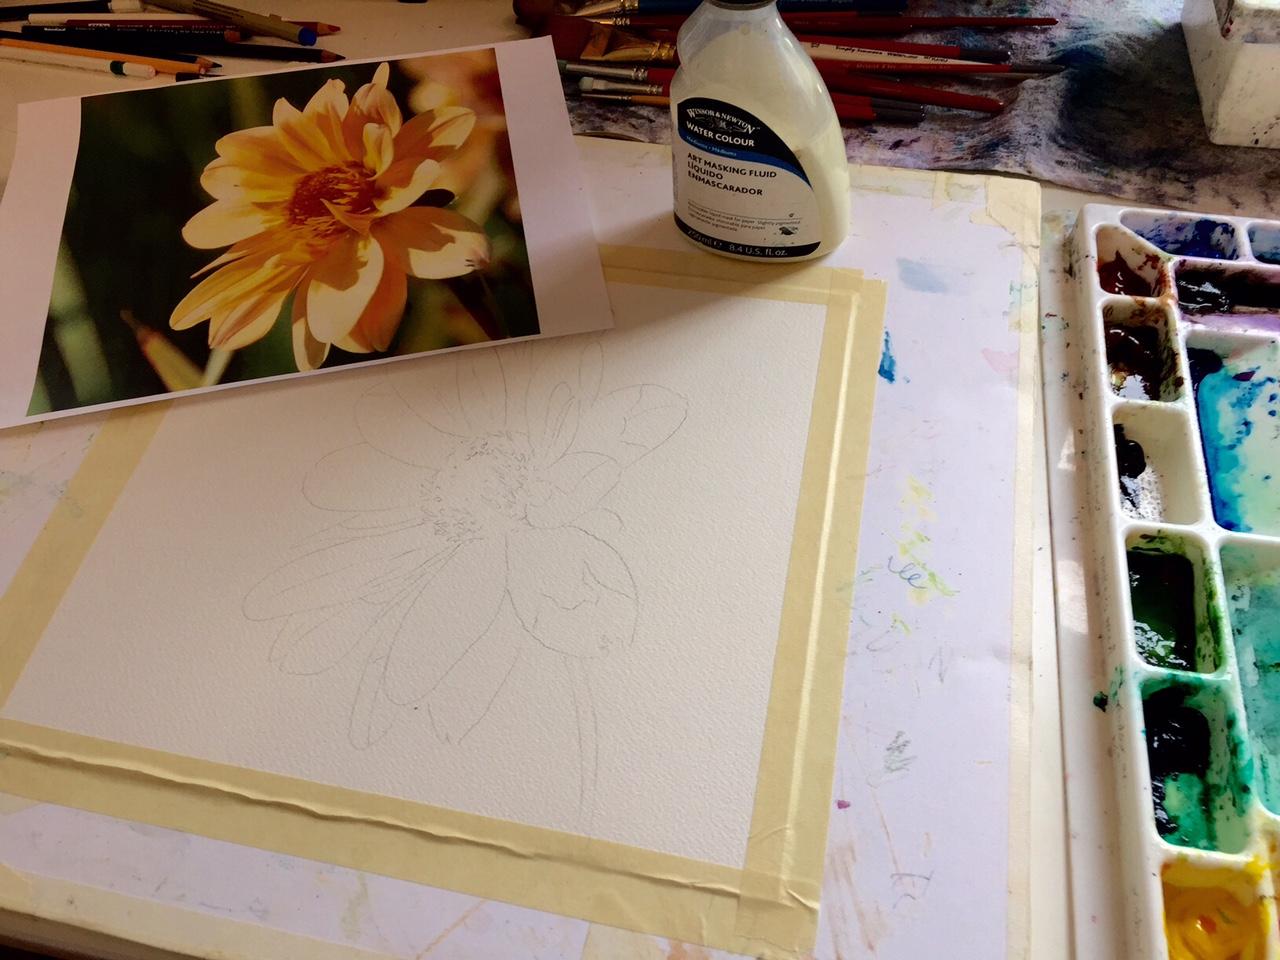 Pencil sketch of flower